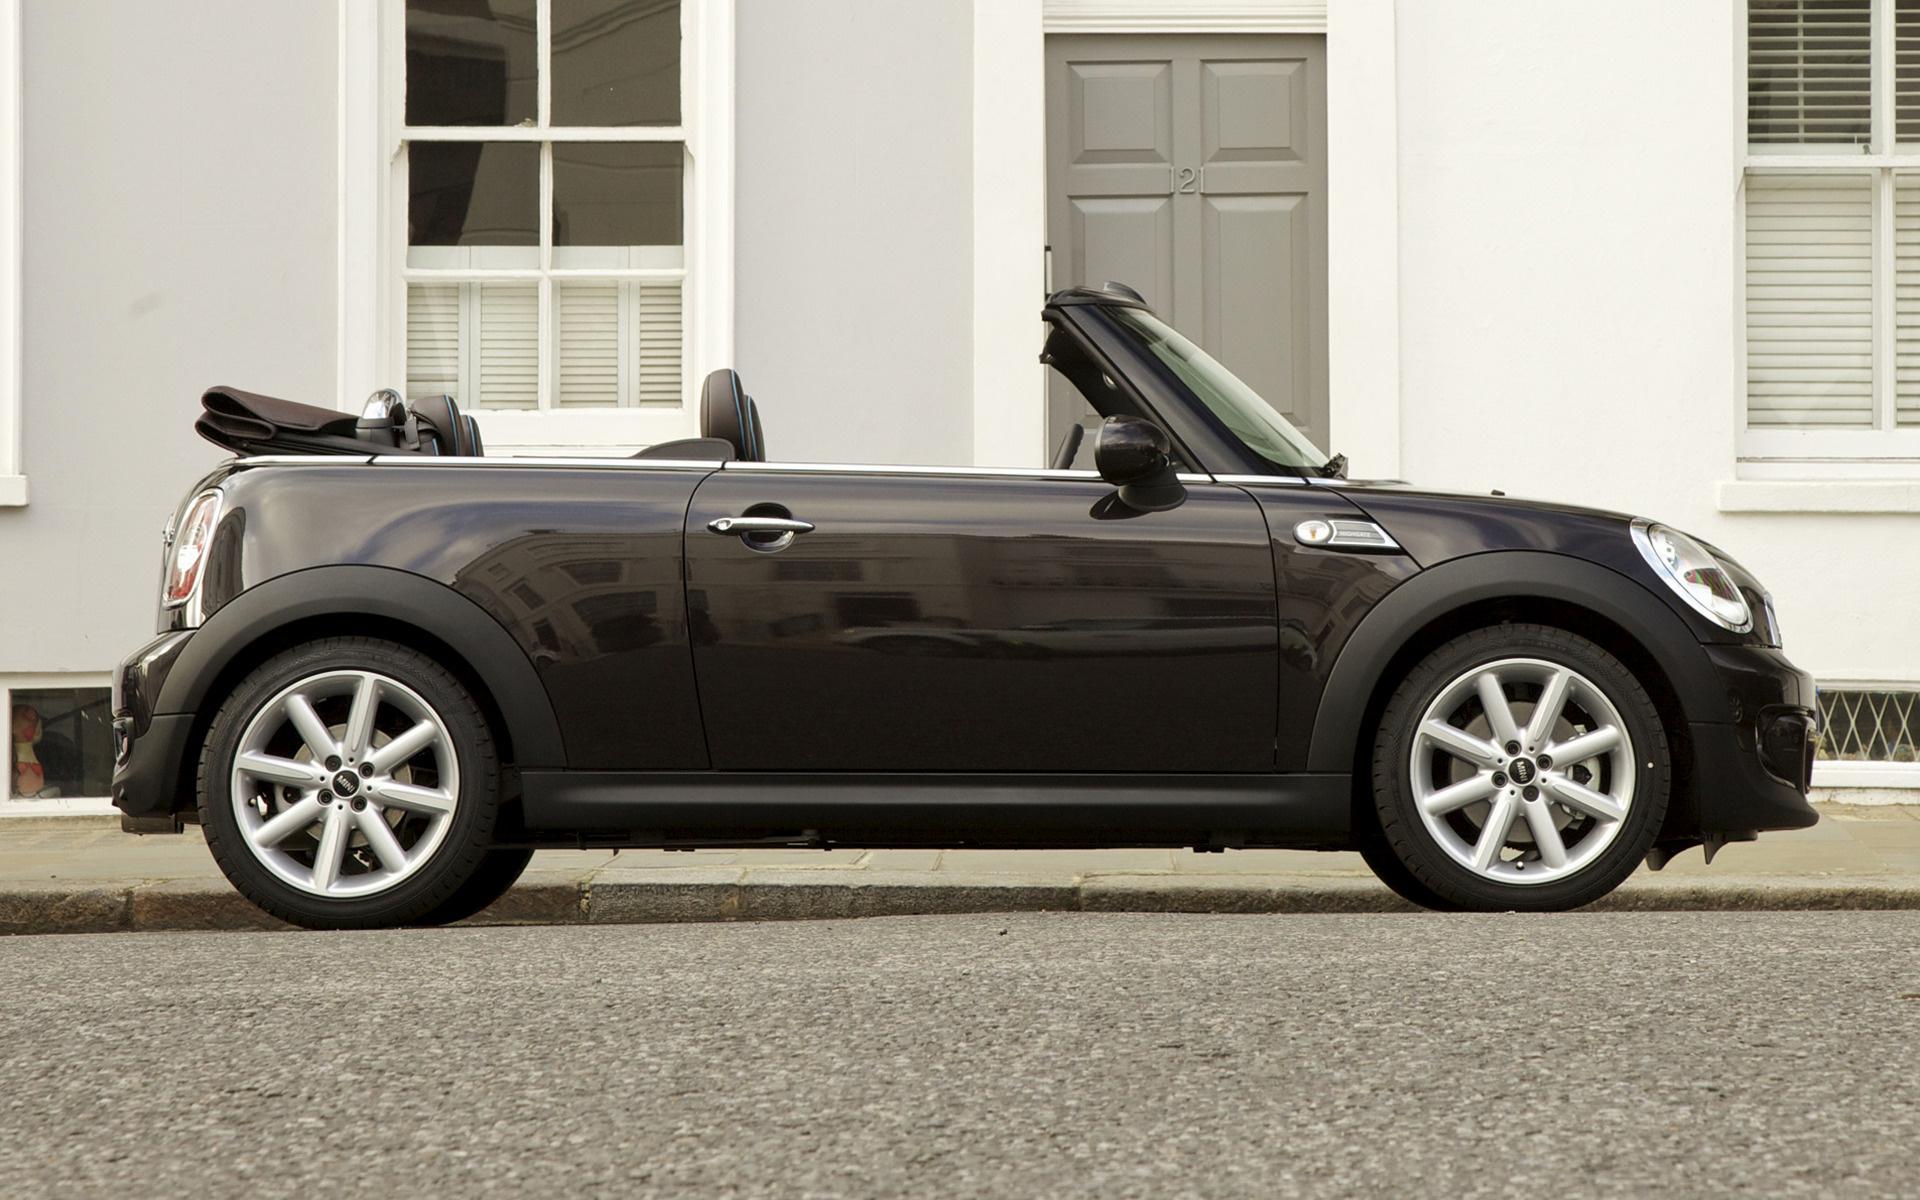 Convertible Car Seat >> 2012 Mini Cooper S Convertible Highgate (UK) - Wallpapers and HD Images   Car Pixel